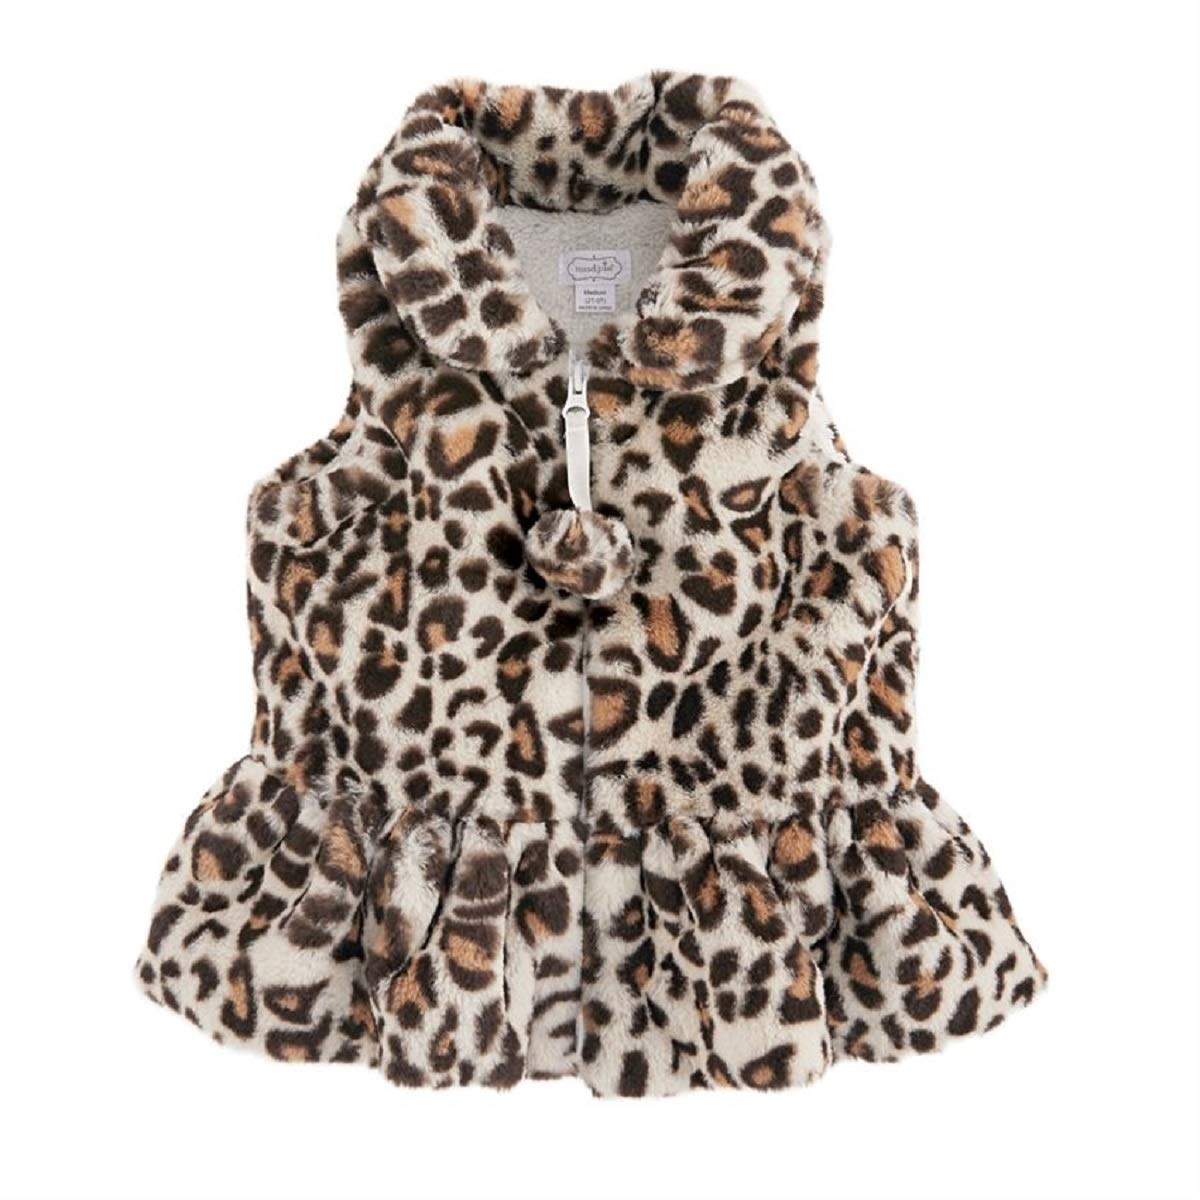 Mud Pie Baby Girl Faux Leopard Fur Vest (Ivory, Medium (2T-3T)) by Mud Pie